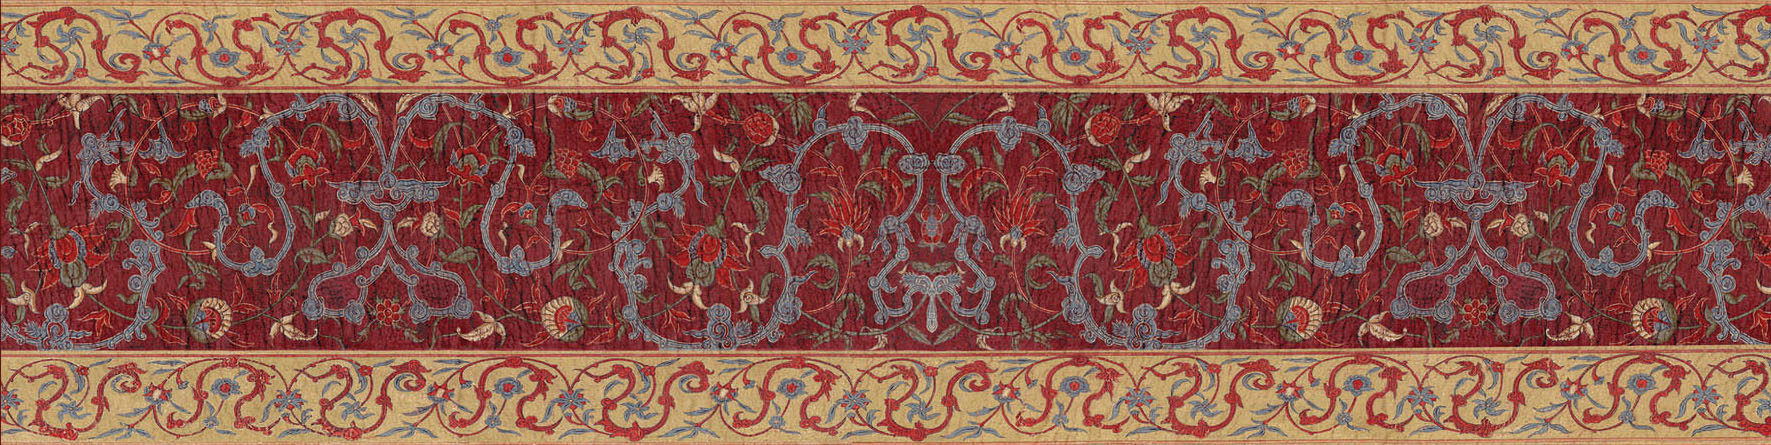 Английские обои Iksel,  коллекция Scenic & Architectural Wallpapers, артикулAleppoRedALREDBORDER3